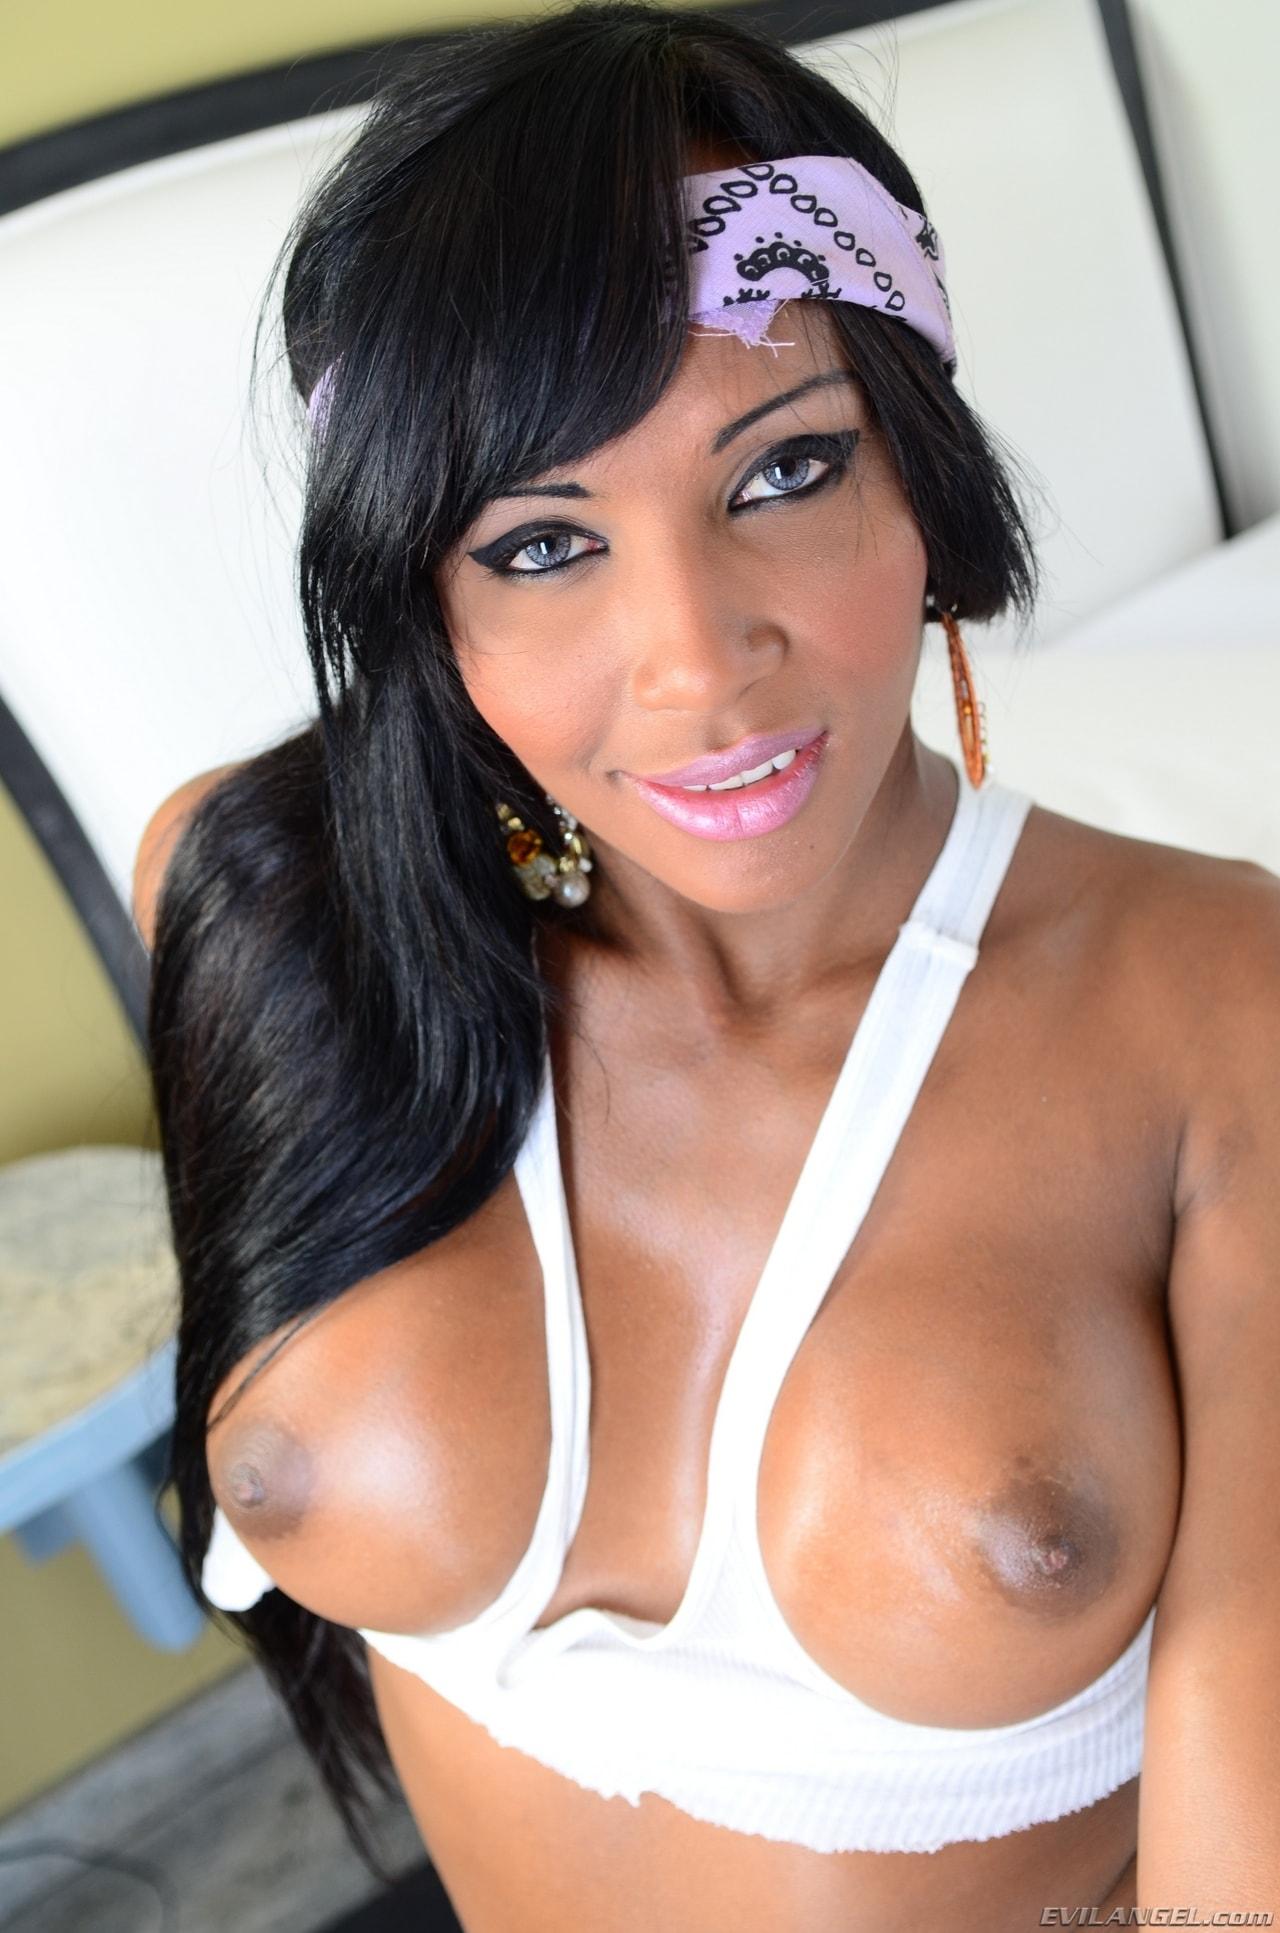 I Love Black Shemales 'Big Tit She-Male X' starring Alex Victor (Photo 171)